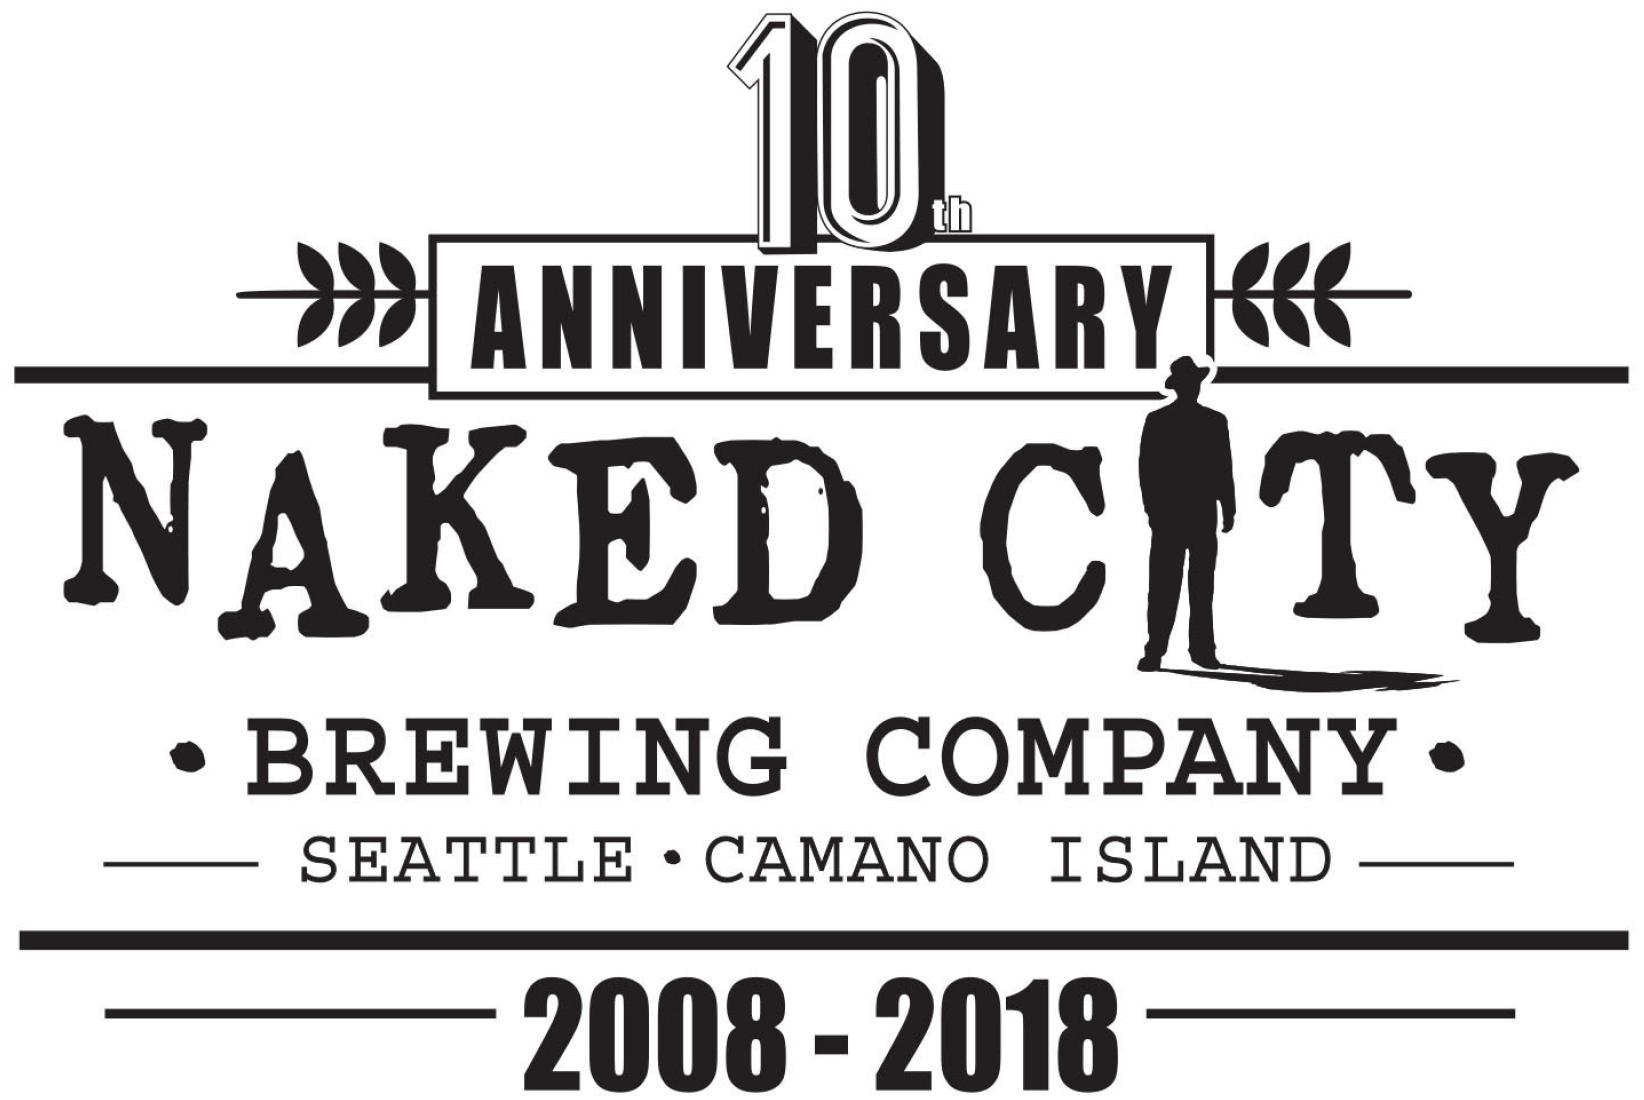 NakedCity10thAnniversaryLogo.png